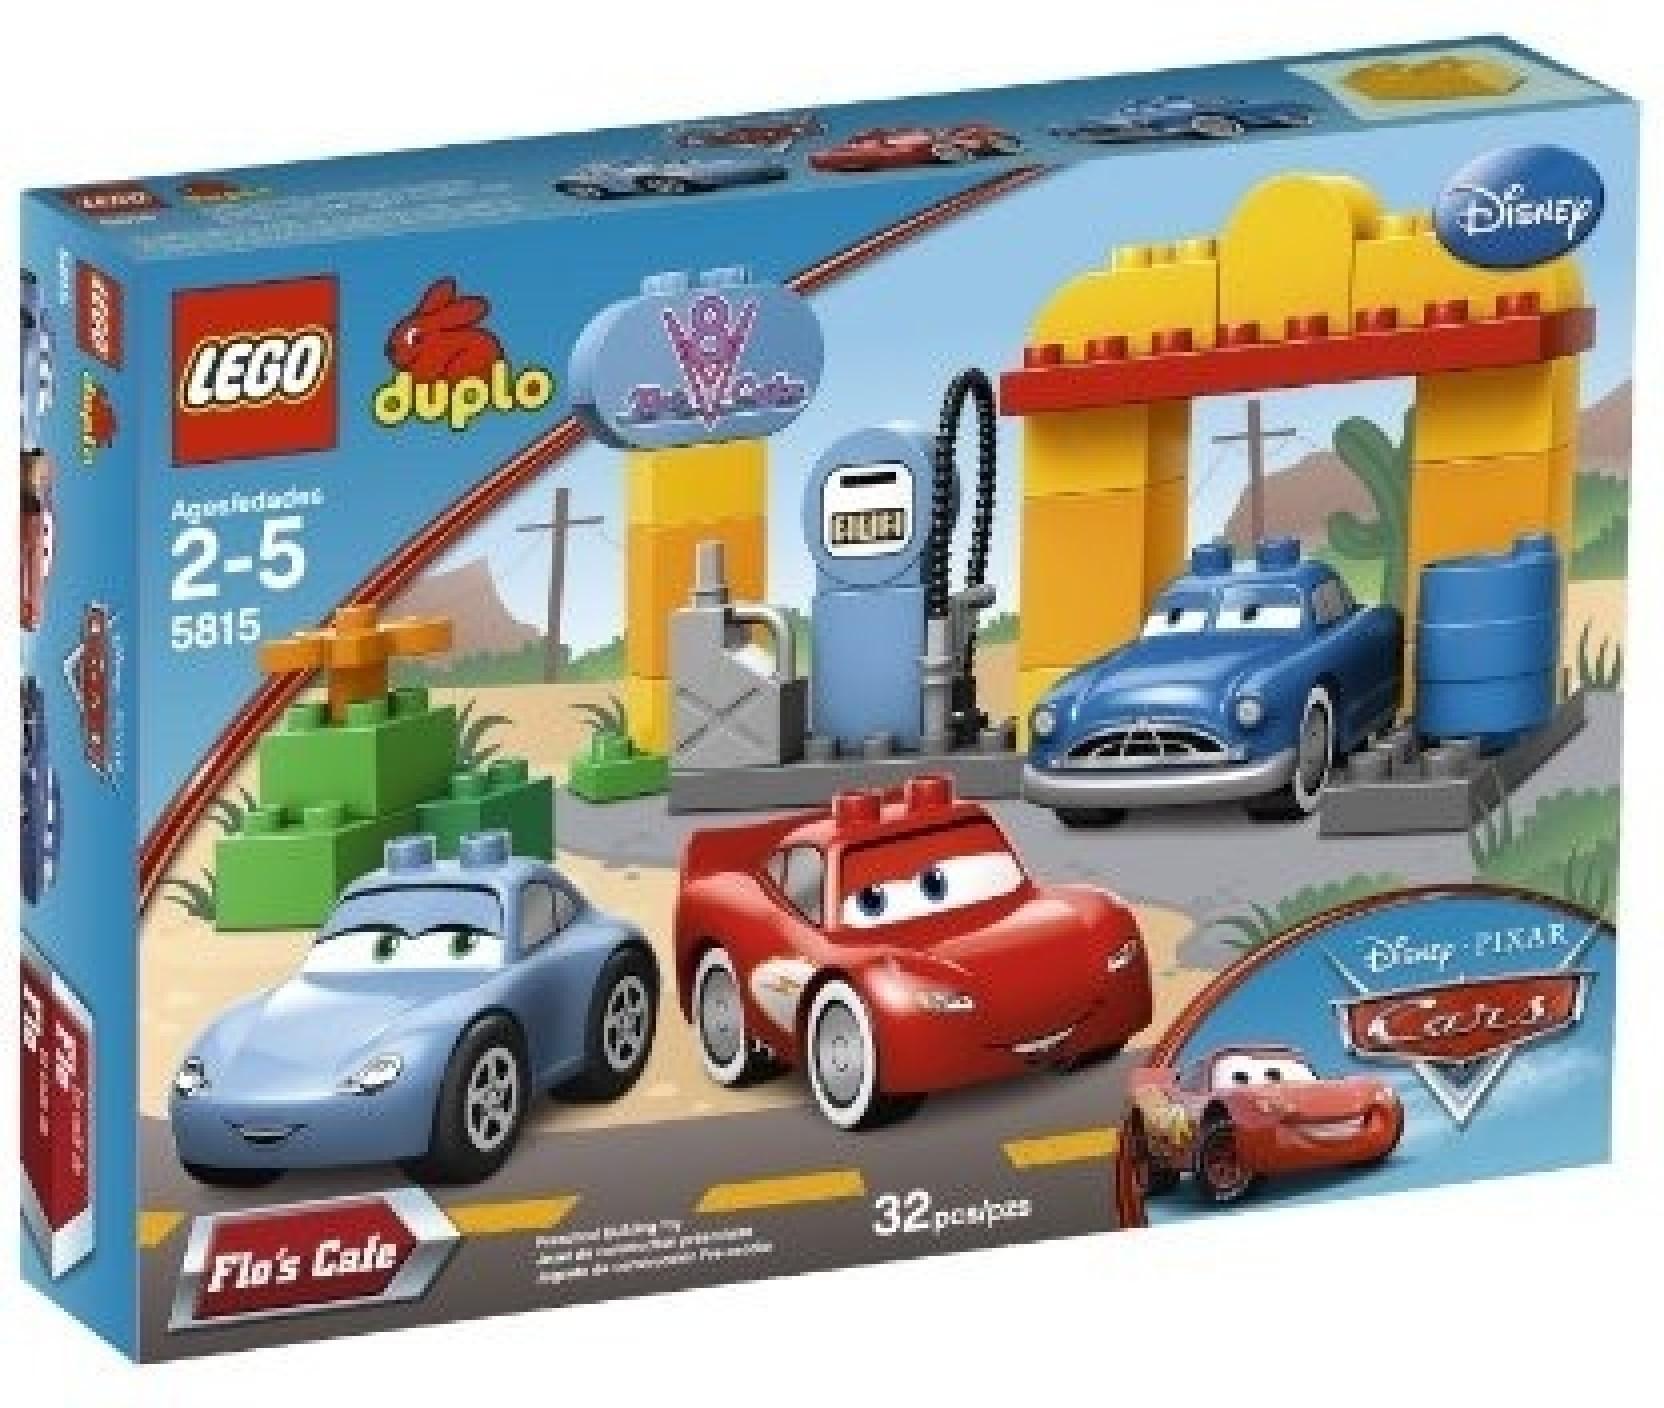 Lego Duplo Cars Flos Cafe 5815 Shop Ultimate Race Set 9485 Share